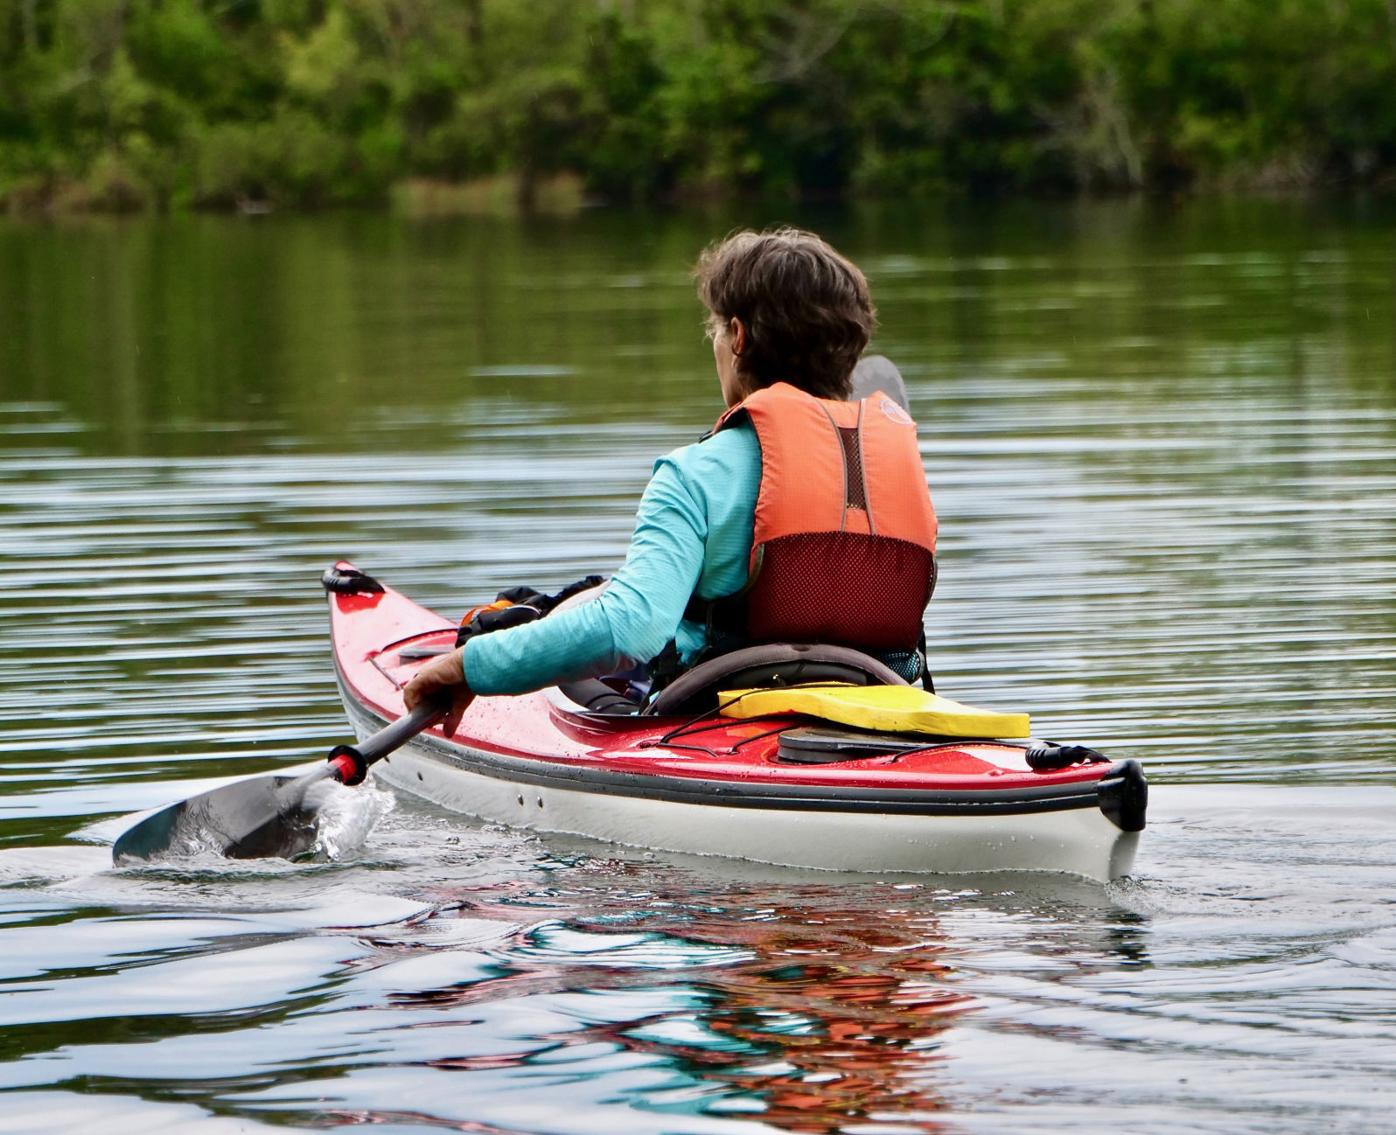 Villagers find escape on the waterways